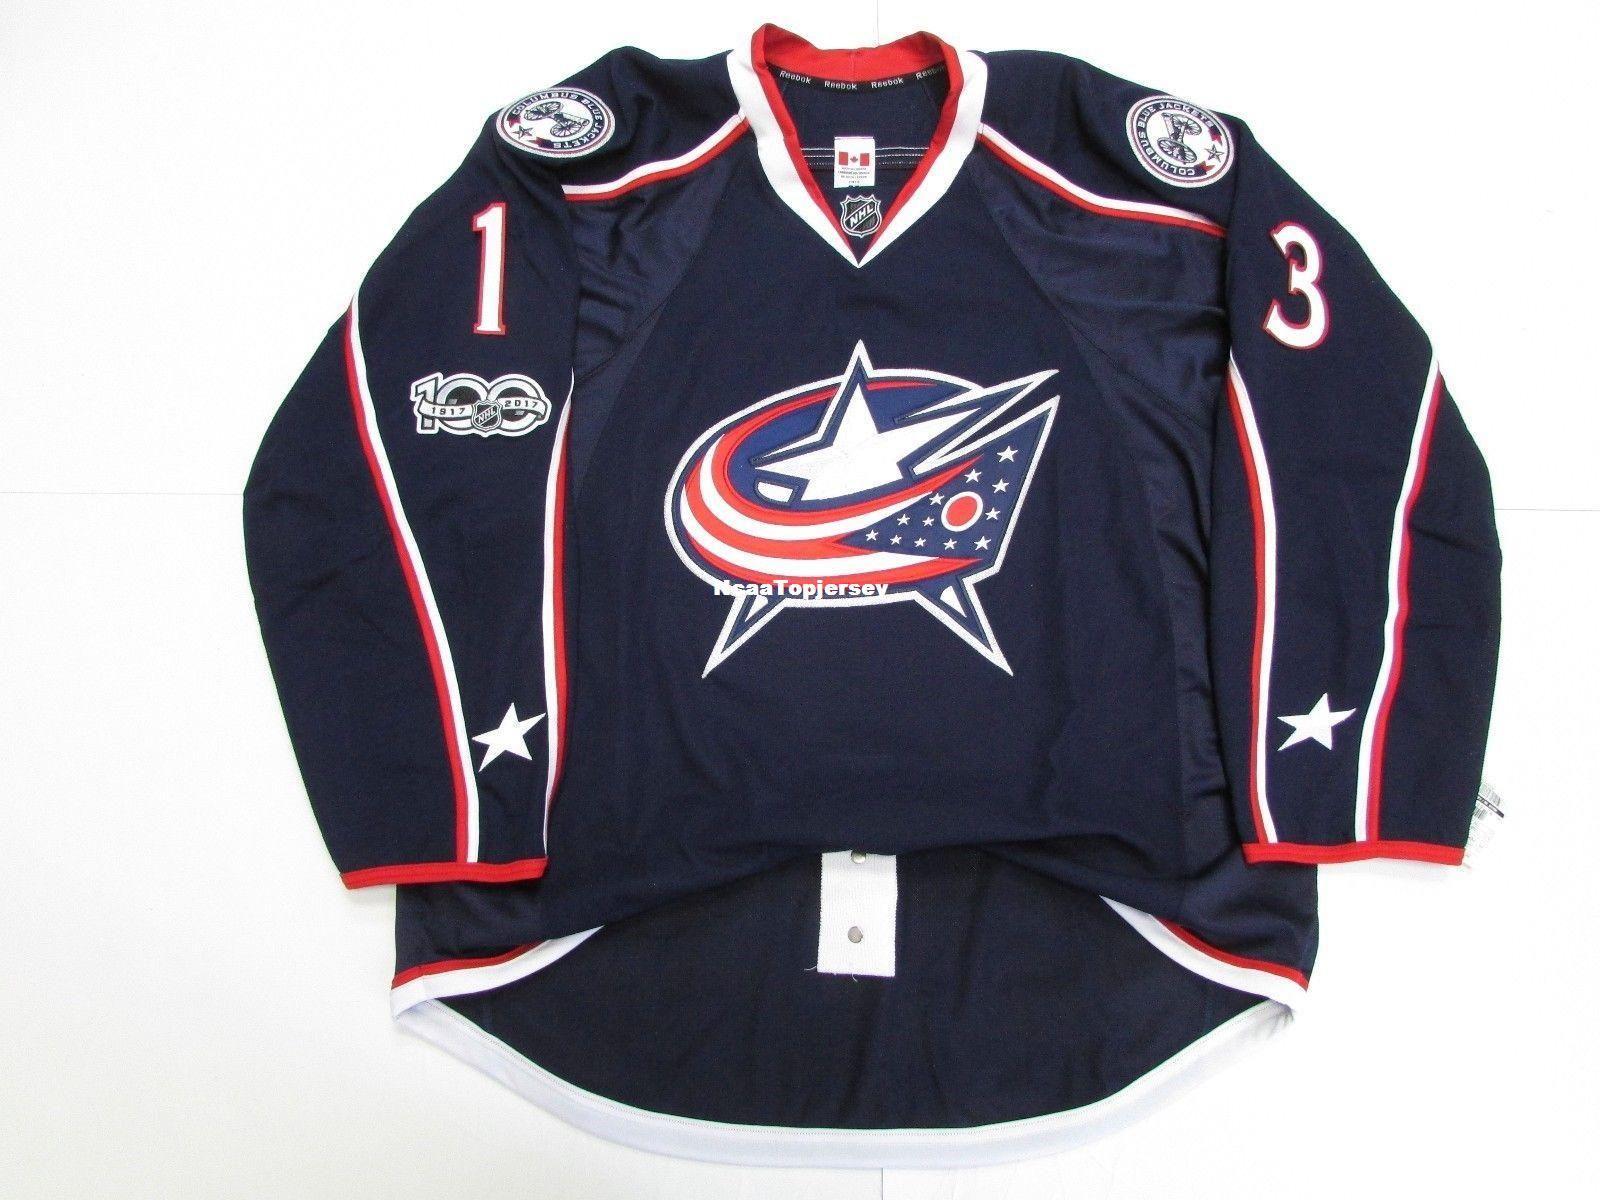 Cheap Custom ATKINSON COLUMBUS BLUE JACKETS HOME 100th ANNIVERSARY JERSEY  Stitch Add Any Number Any Name Mens Hockey Jersey XS-6XL Retro Hockey Jersey  Cheap ... f682a1ab4